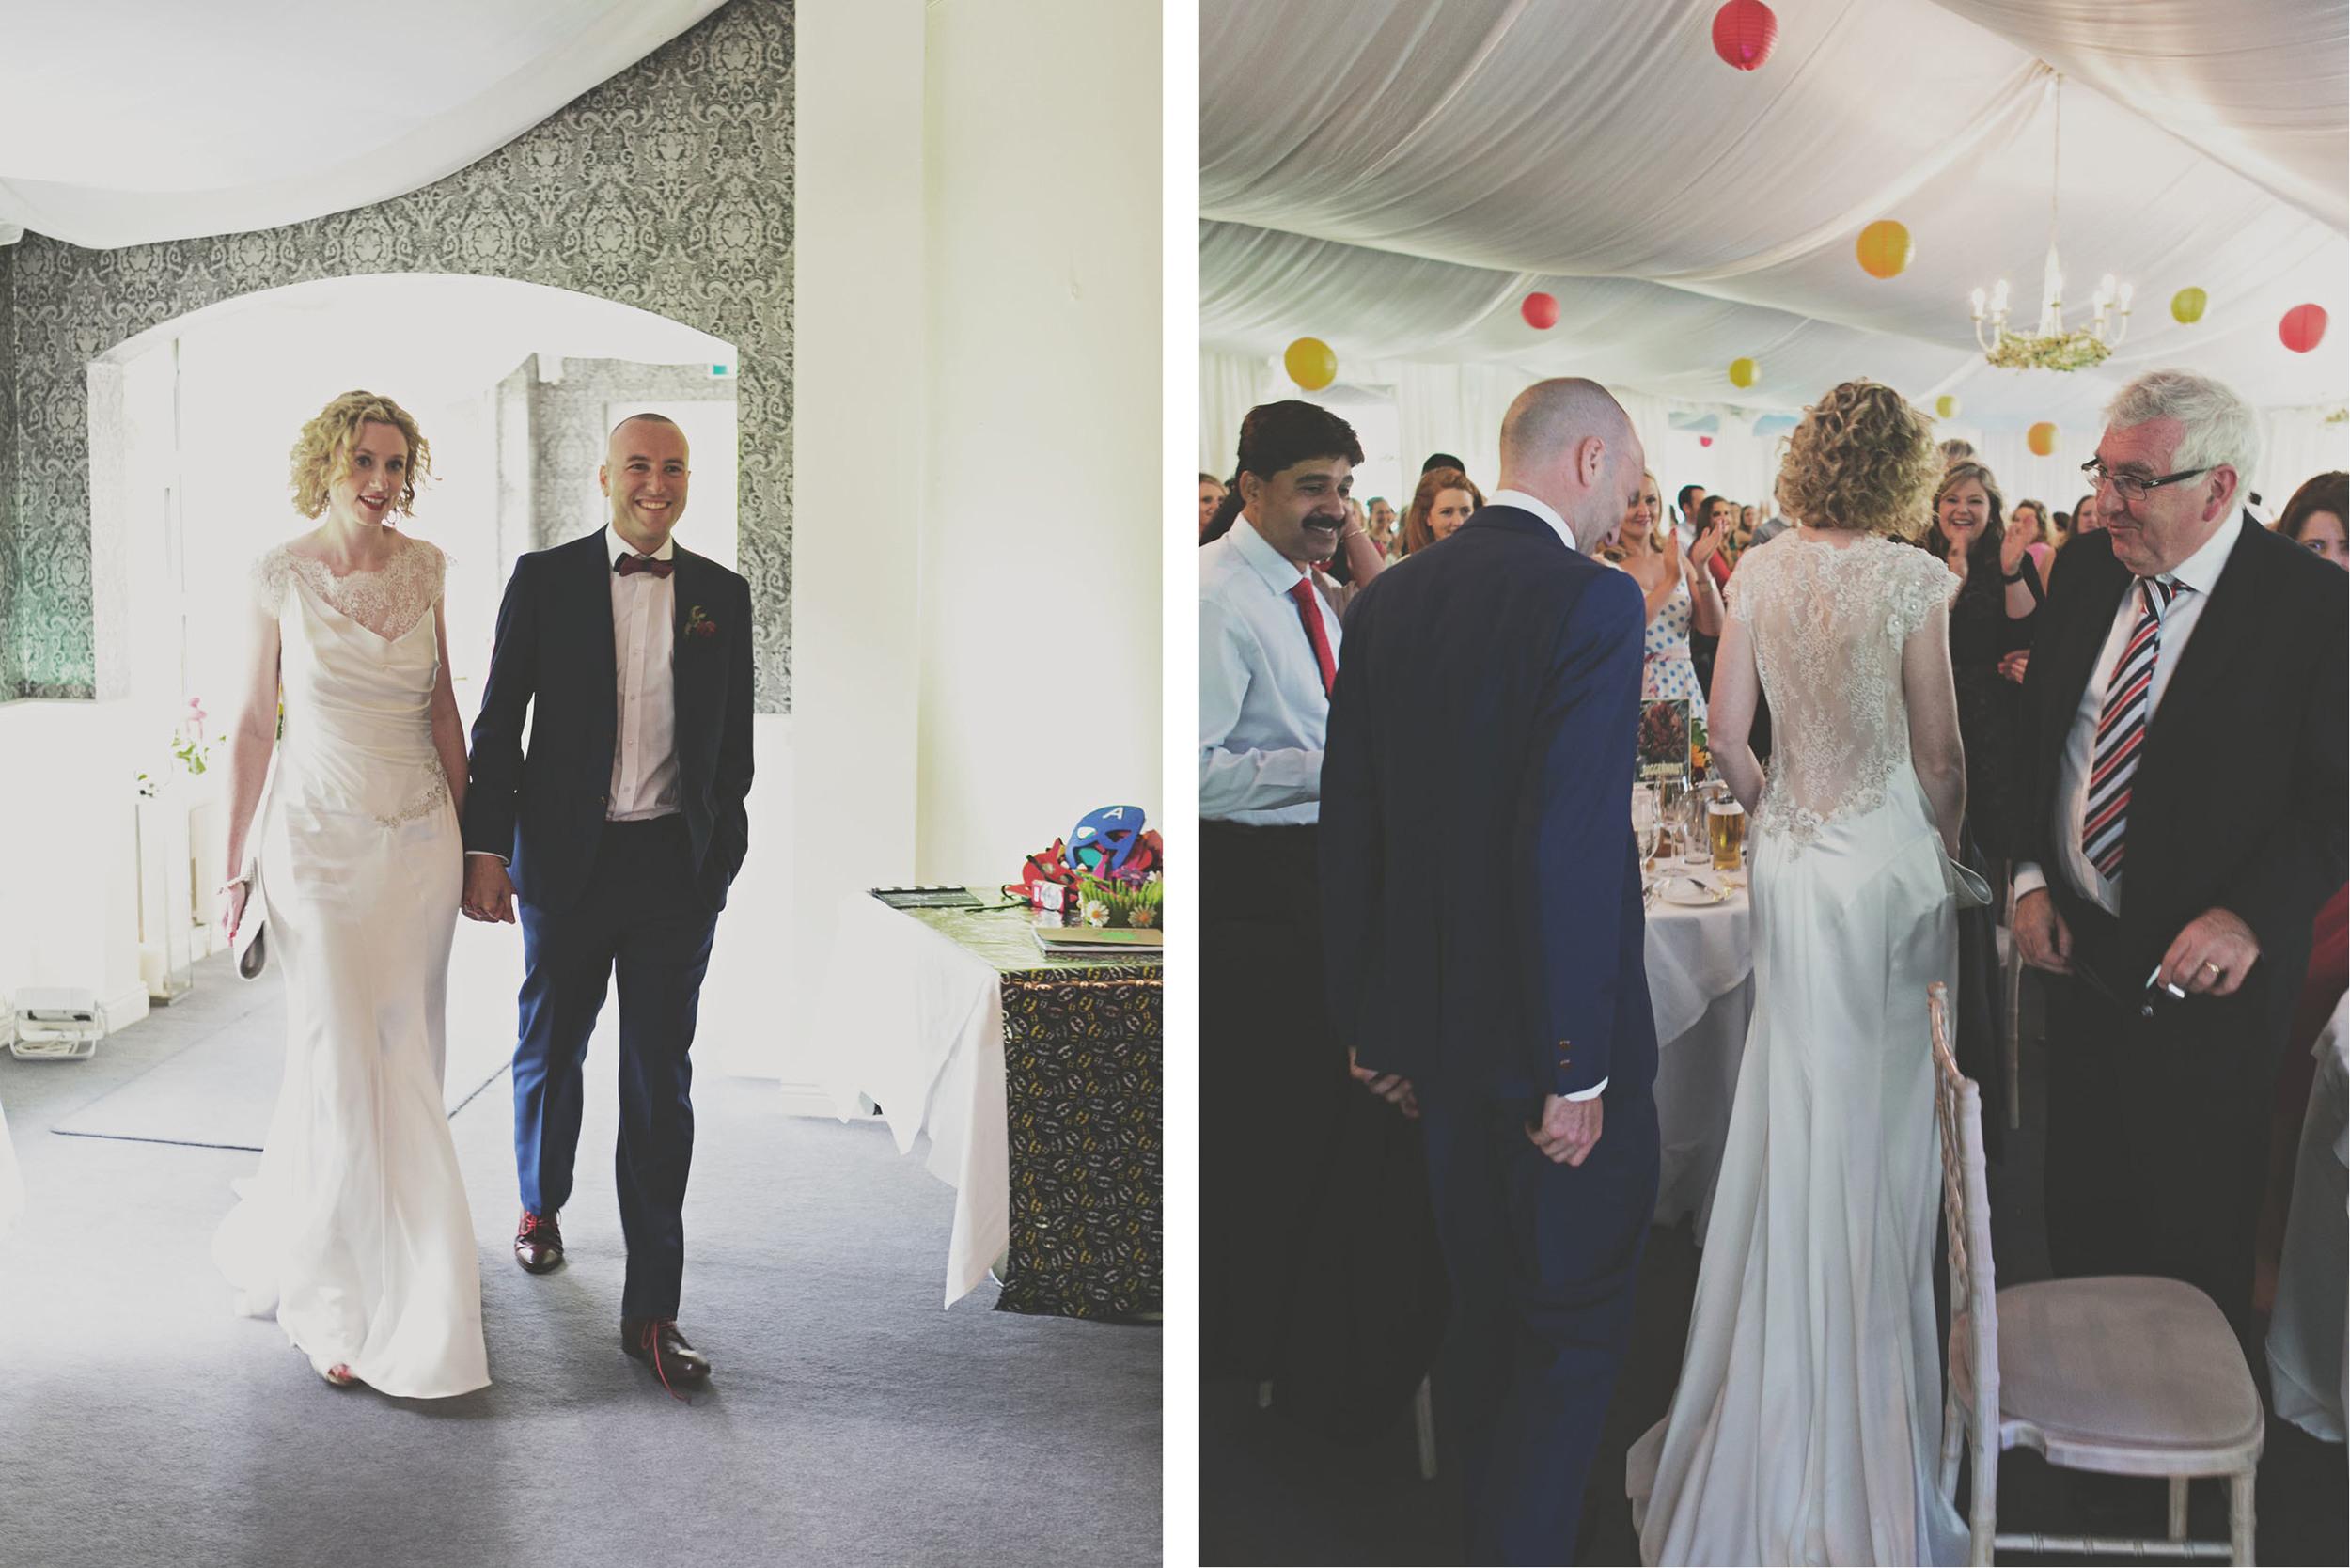 Tanya & Paul's Rathsallagh Wedding 095.jpg